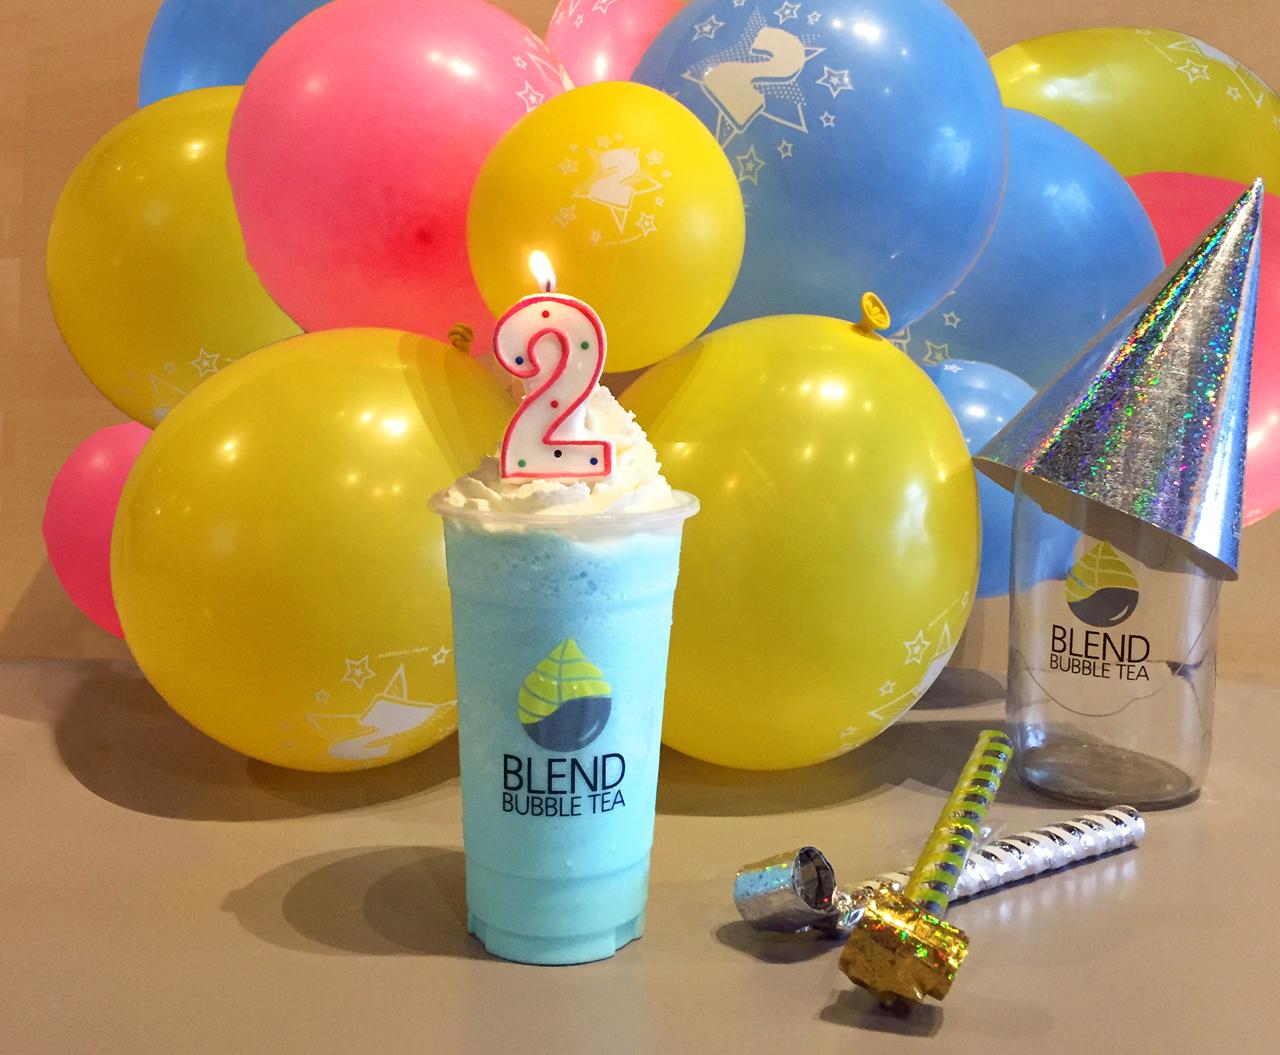 Blend Bubble Tea 2nd Birthday